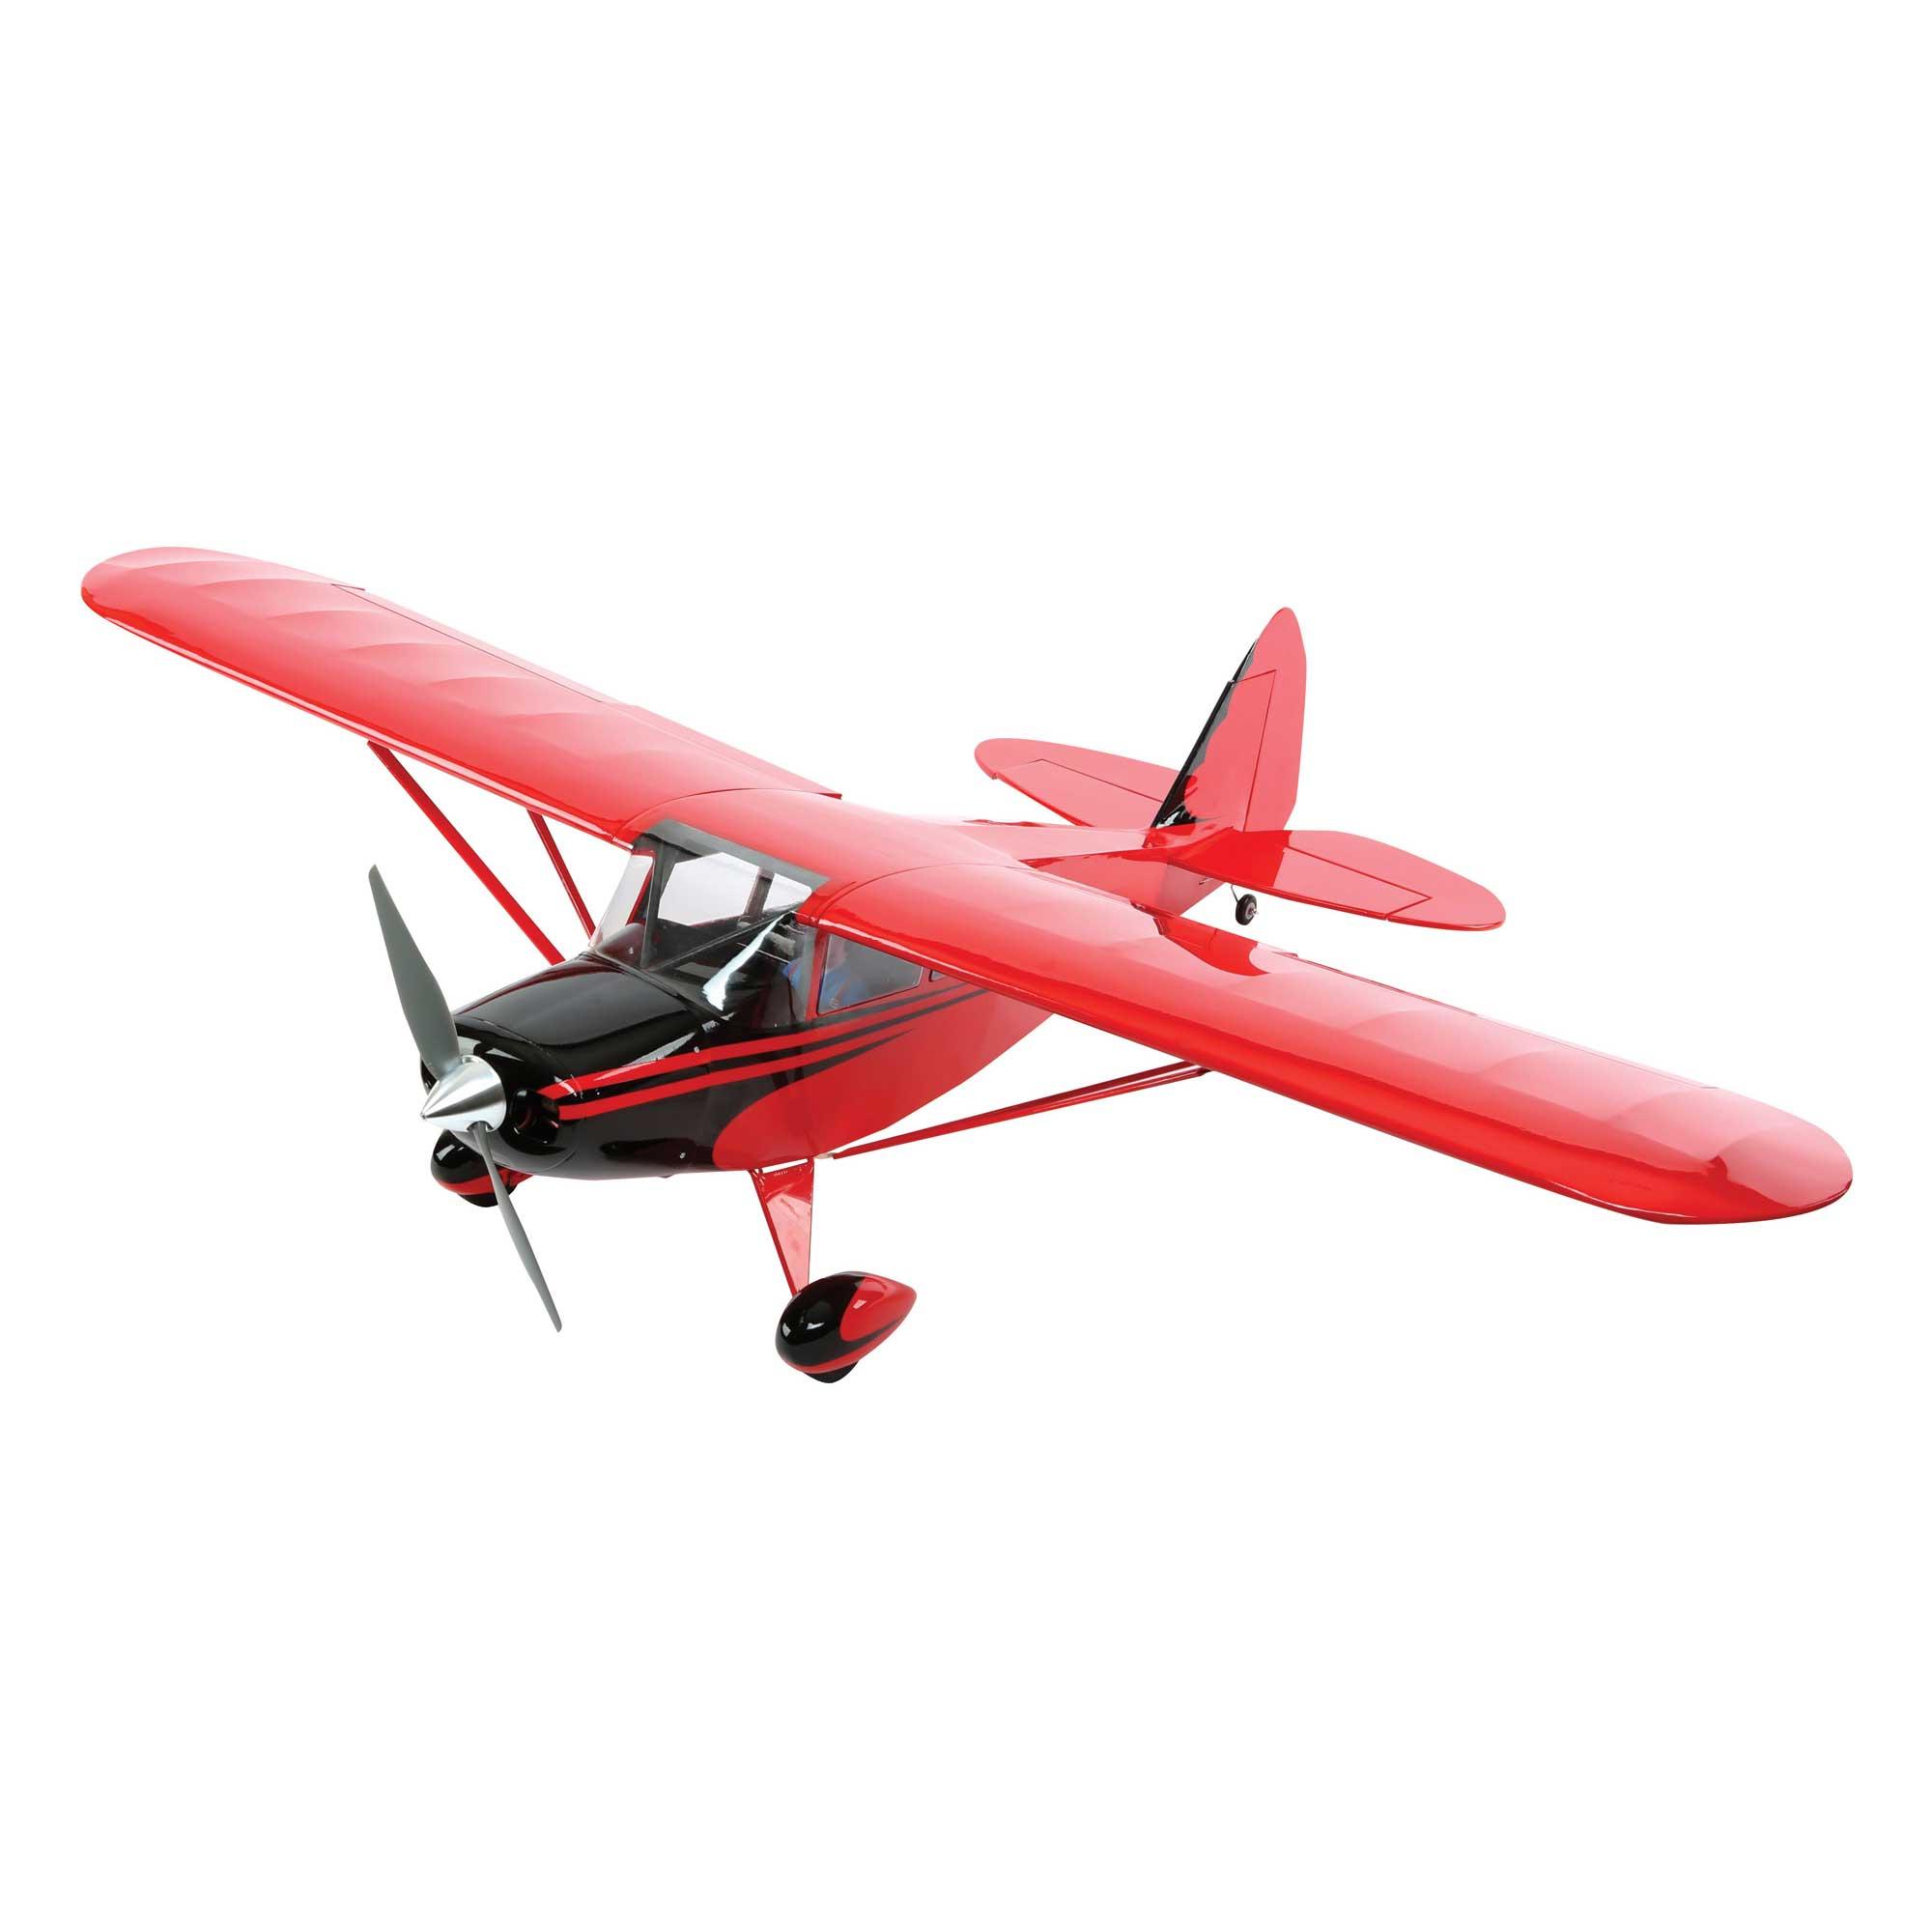 PA-20 Pacer E-flite